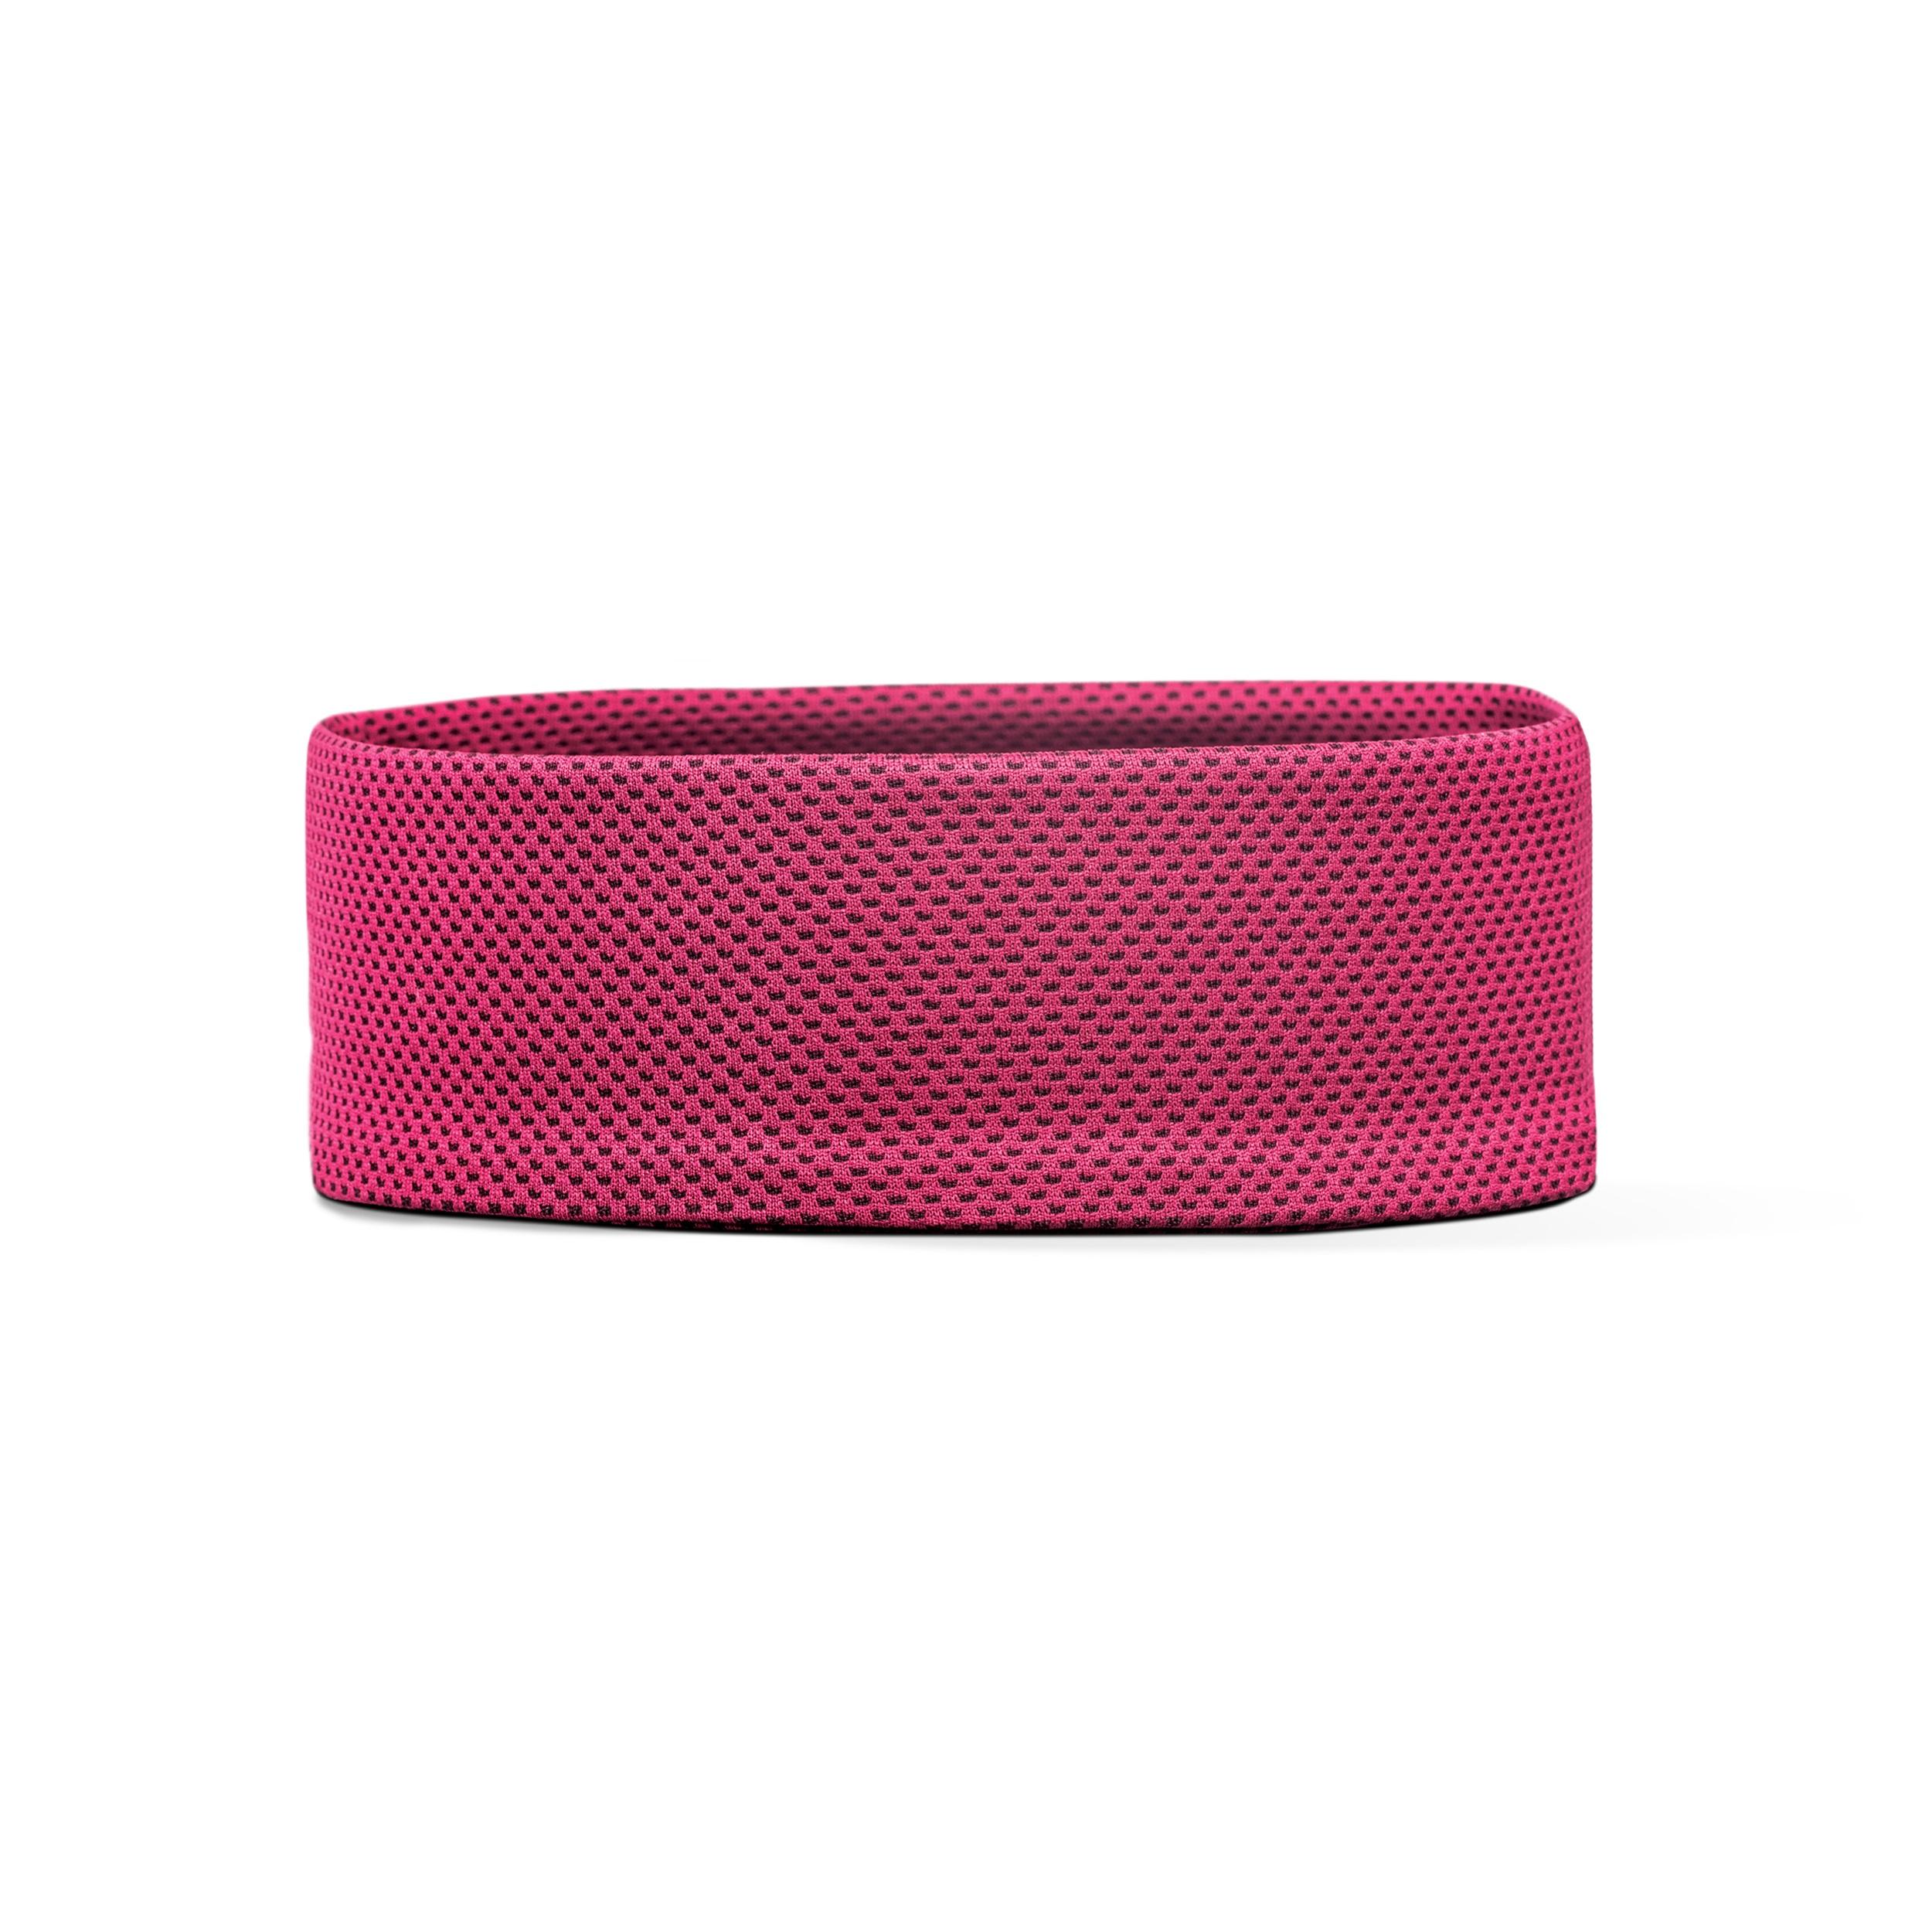 Perfect Fitness Cooling Headband - Verkoelende Hoofdband - Roze